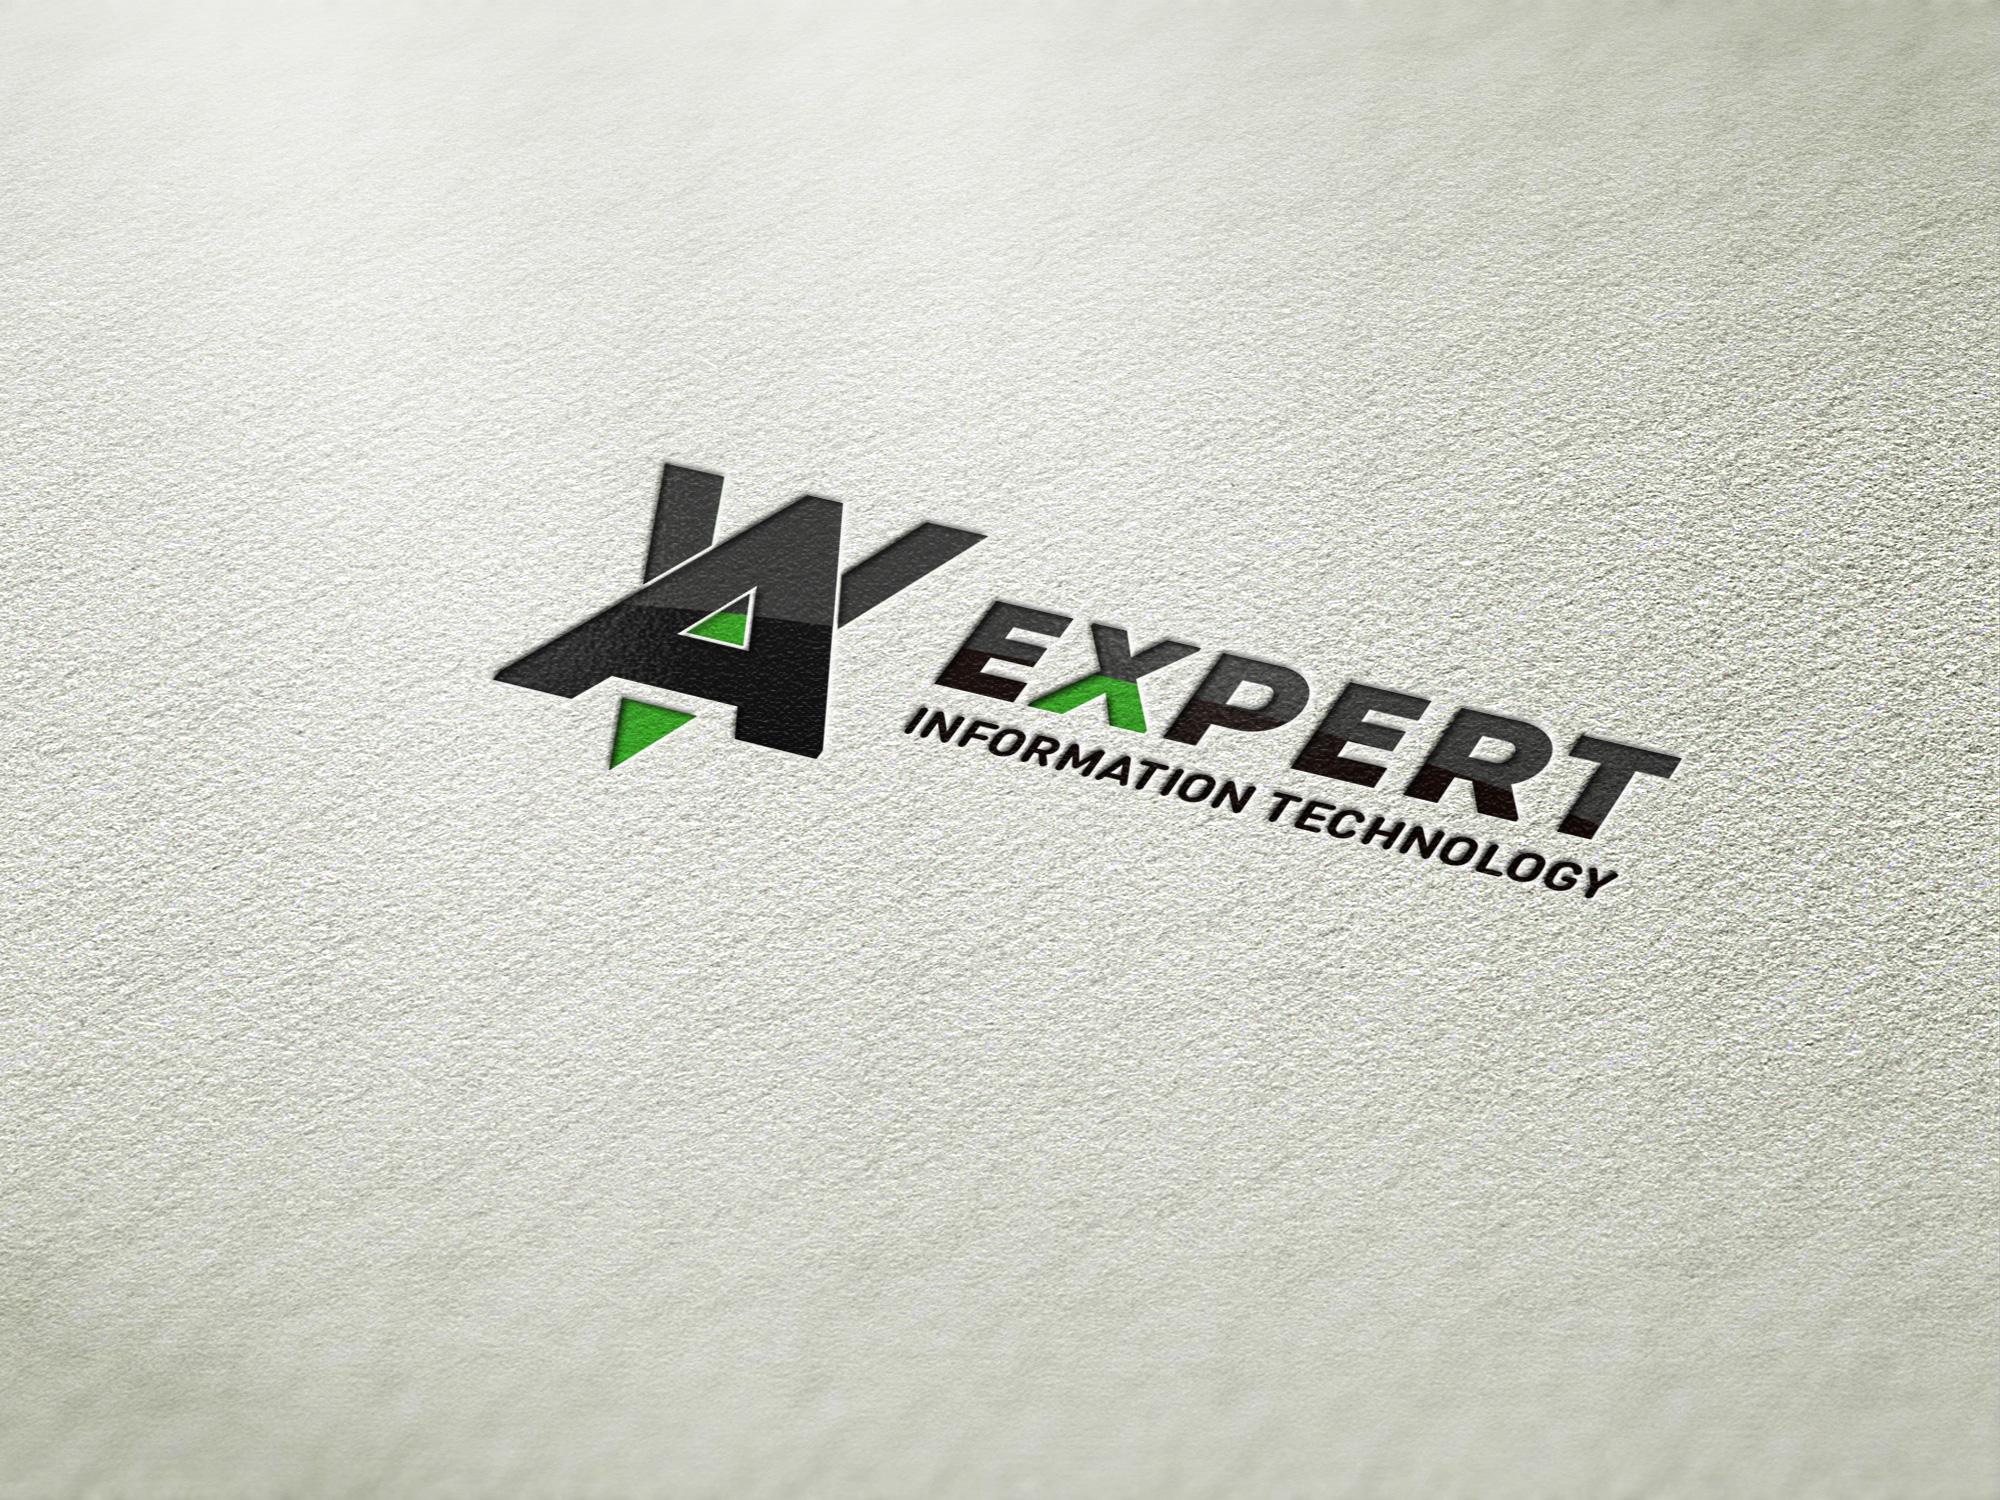 Создание логотипа, фирстиля фото f_9815c67114ebd702.jpg